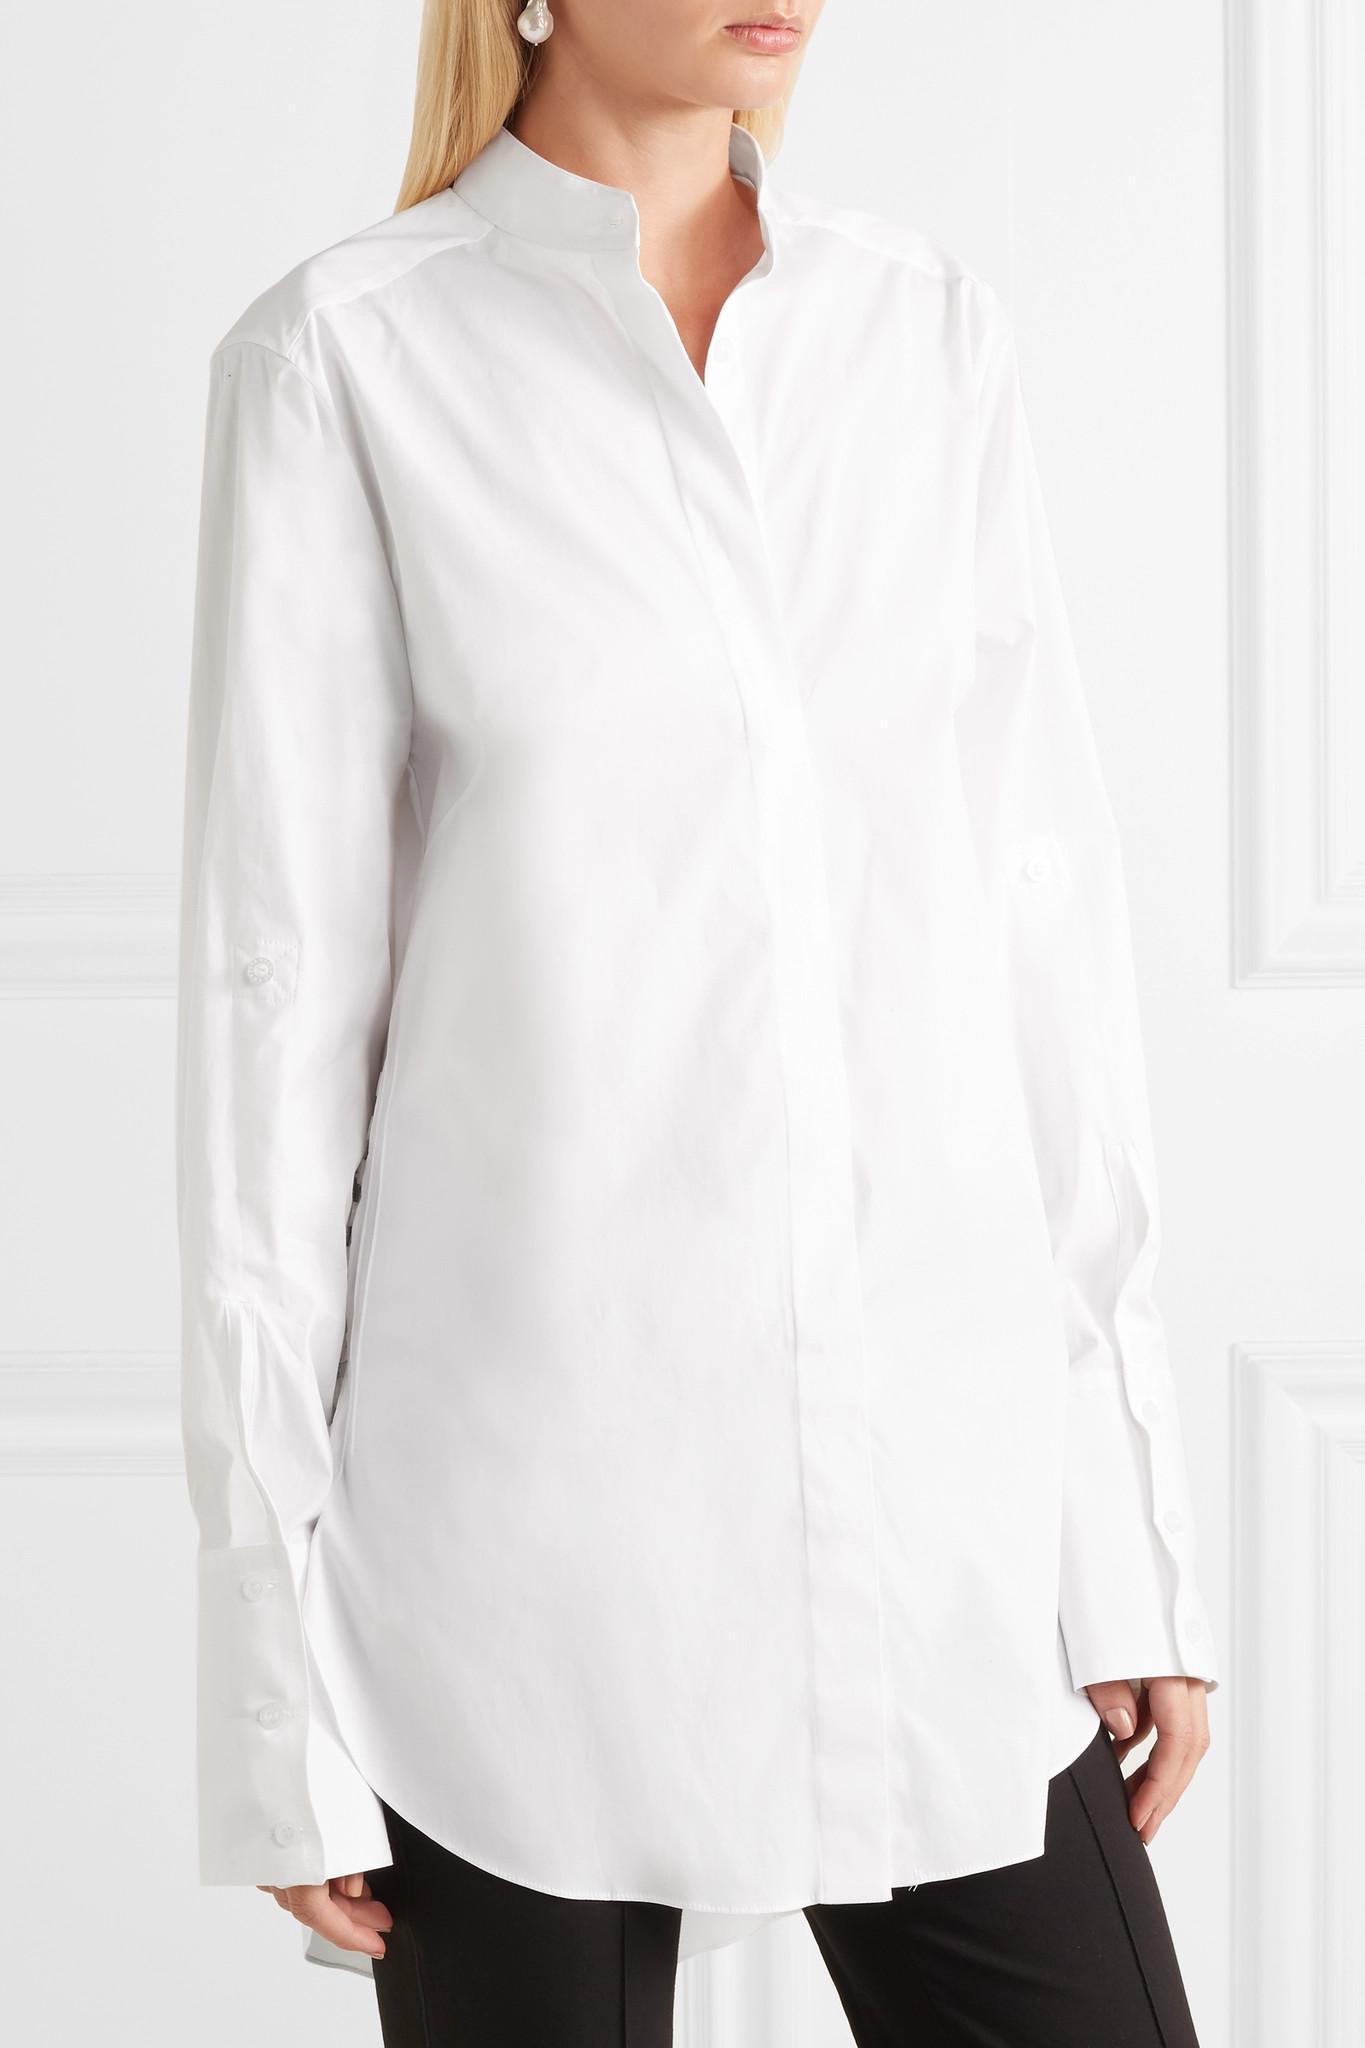 b071eae0e243 oscar-de-la-renta-white-Oversized-Cotton-poplin-Shirt.jpeg